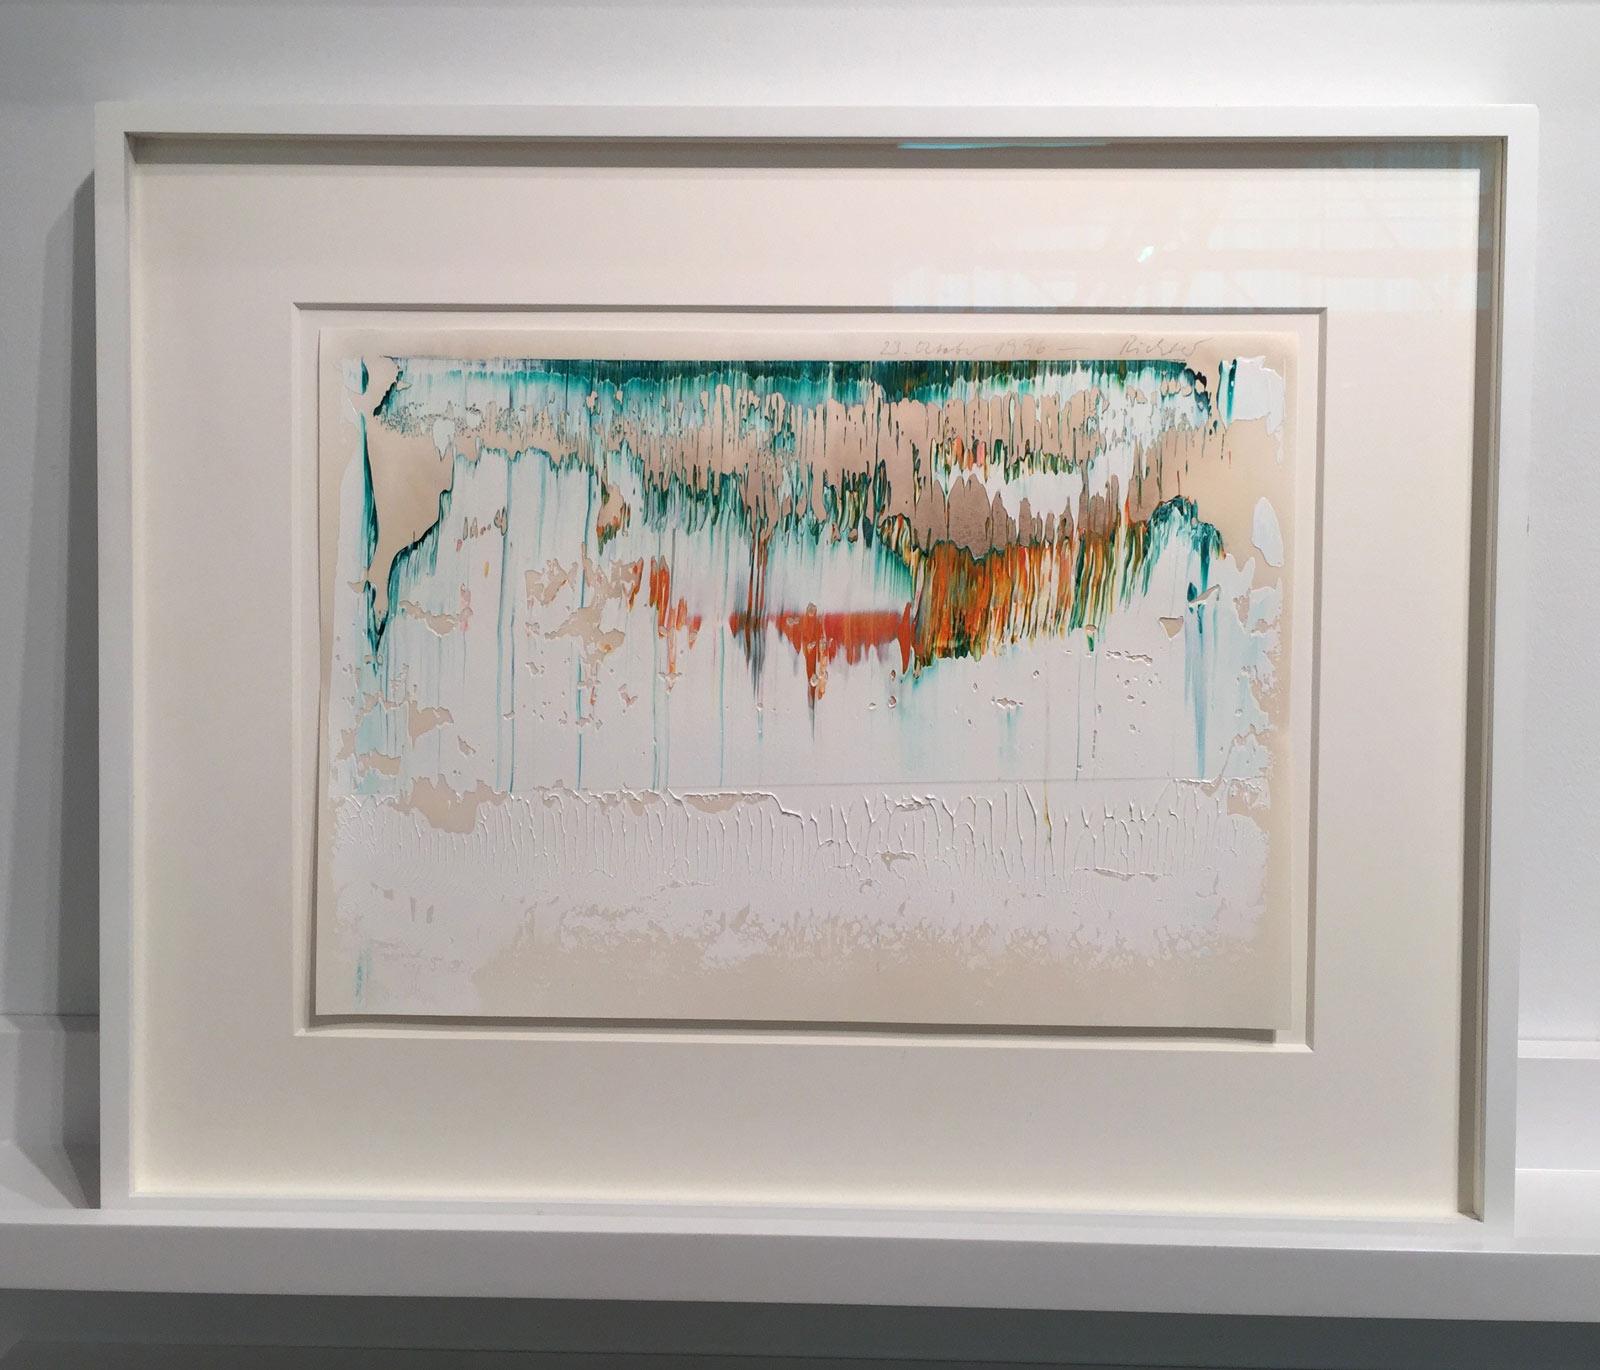 Gerhard-Richter-Paper-Fuji-1996-oil-paper-Casterline-Goodman-Gallery.jpg